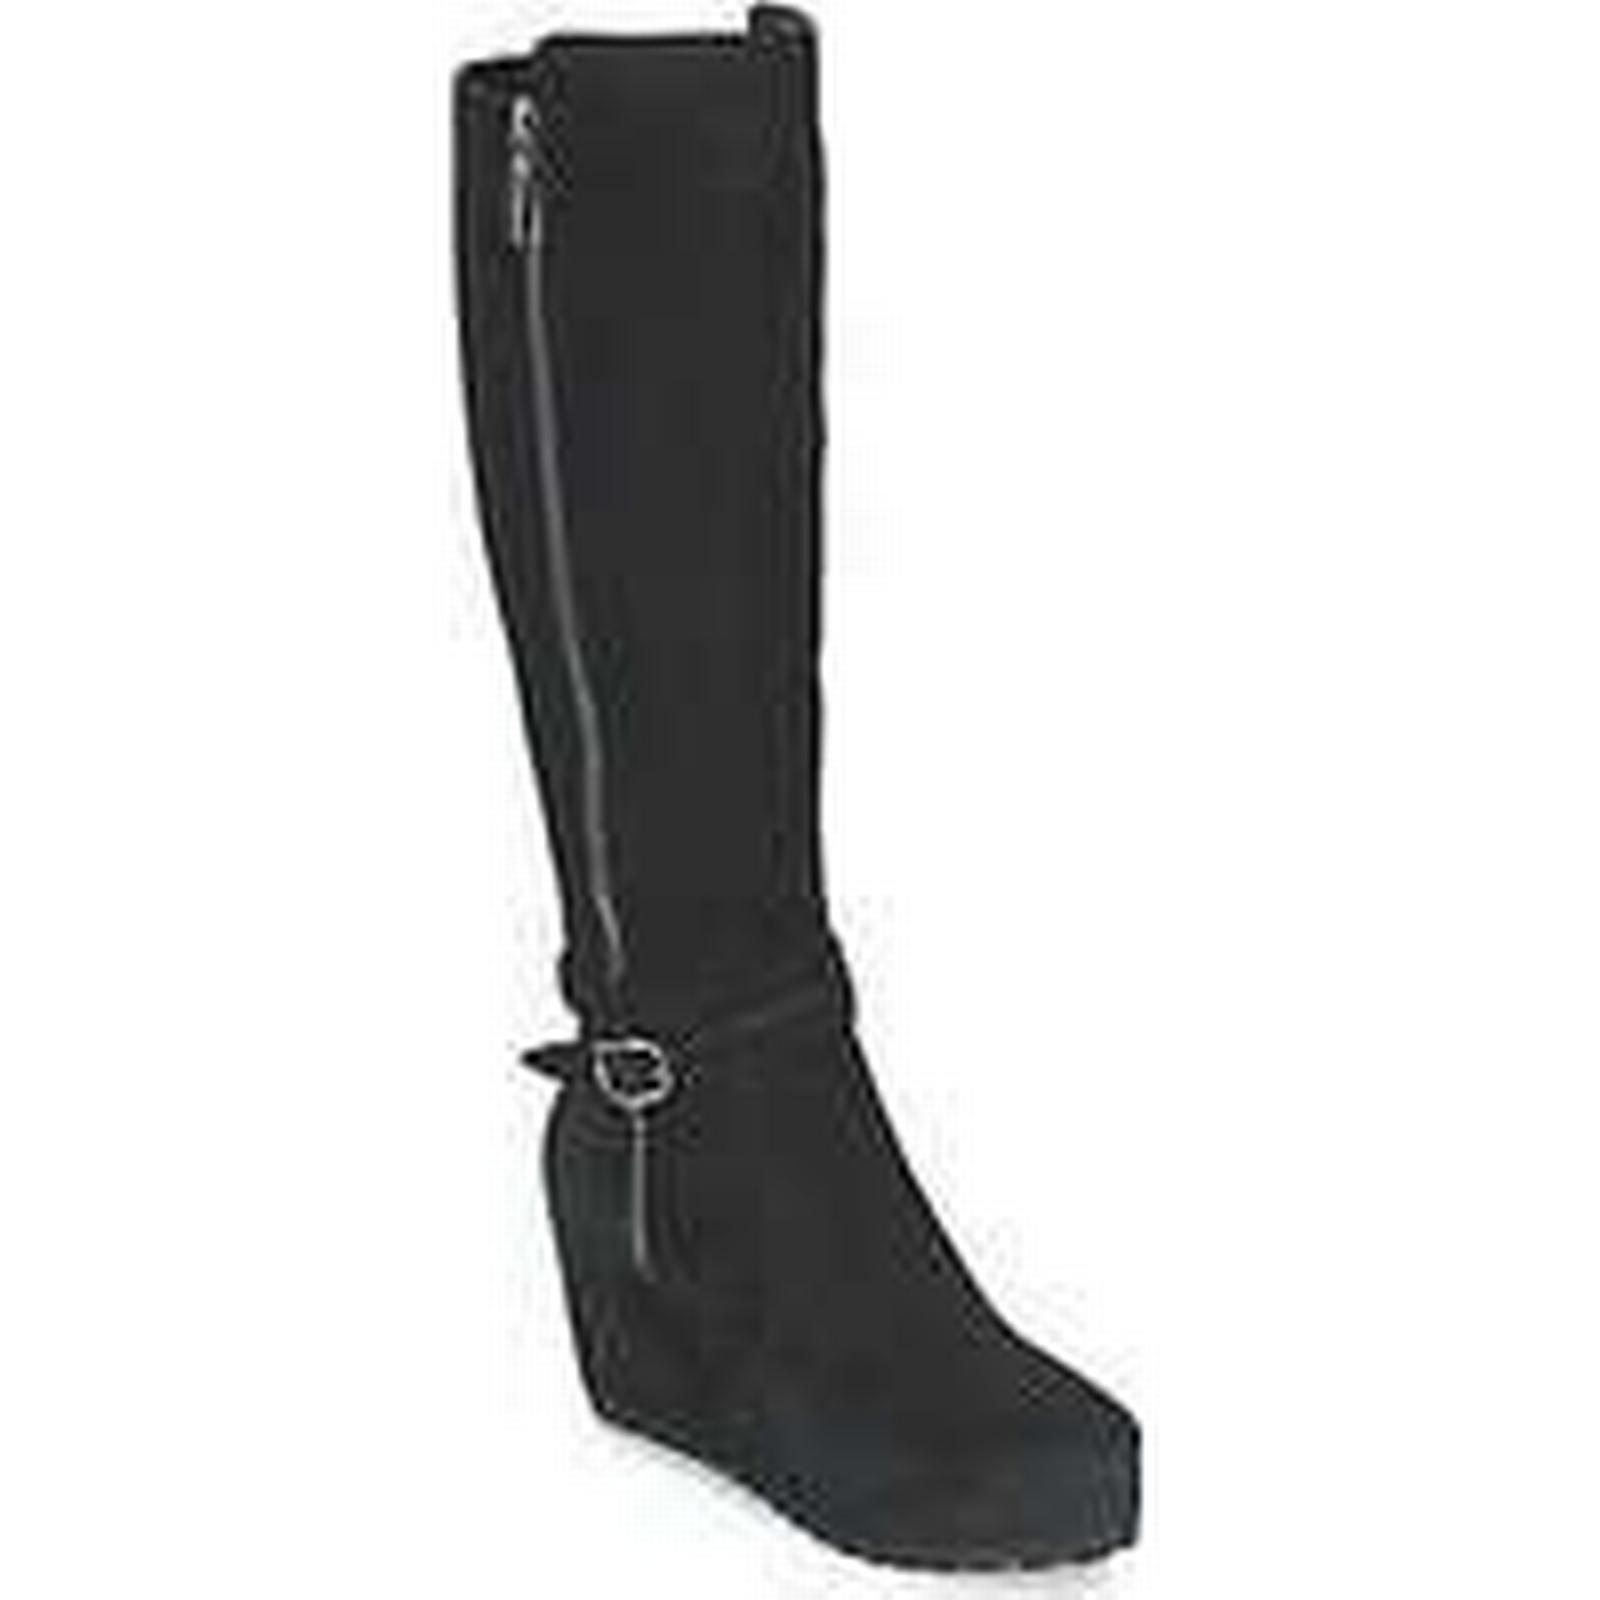 Spartoo.co.uk Moda In Boots Pelle SITA women's High Boots In in Black abd2d1